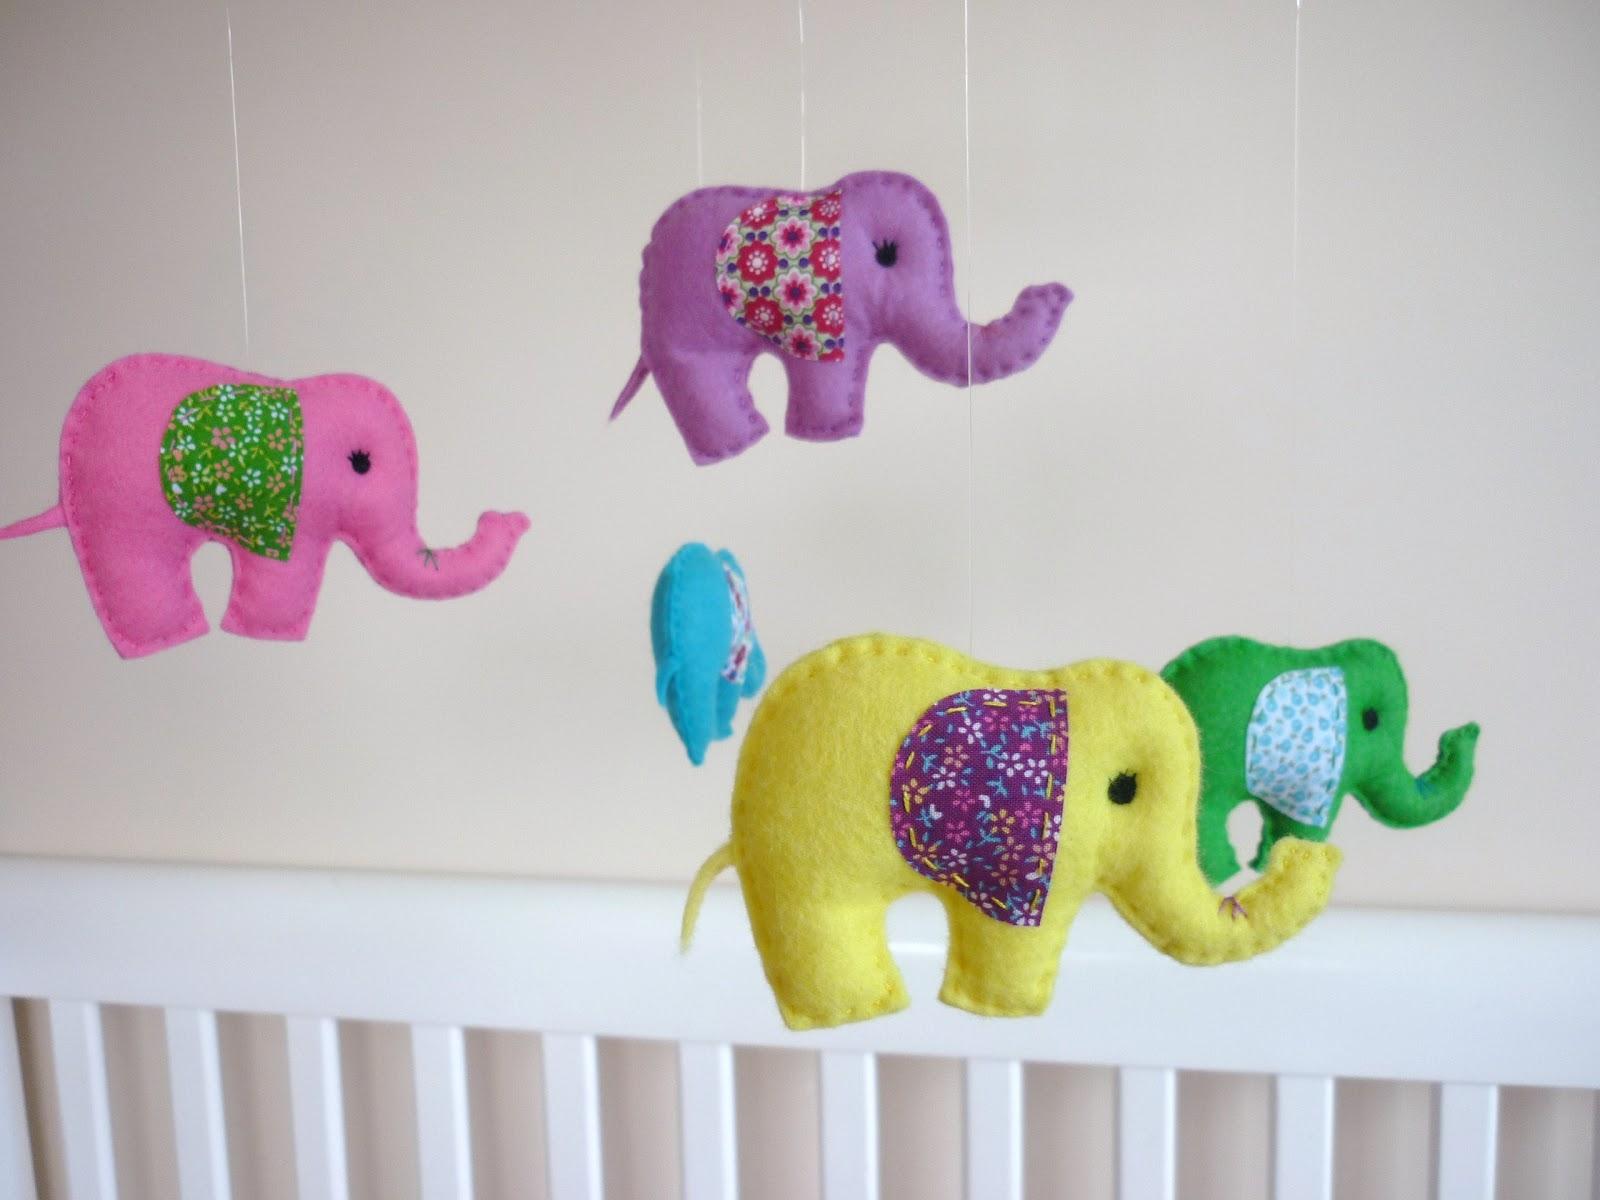 Maisie moo new rainbow baby elephant mobile - Movil para cuna bebe ...